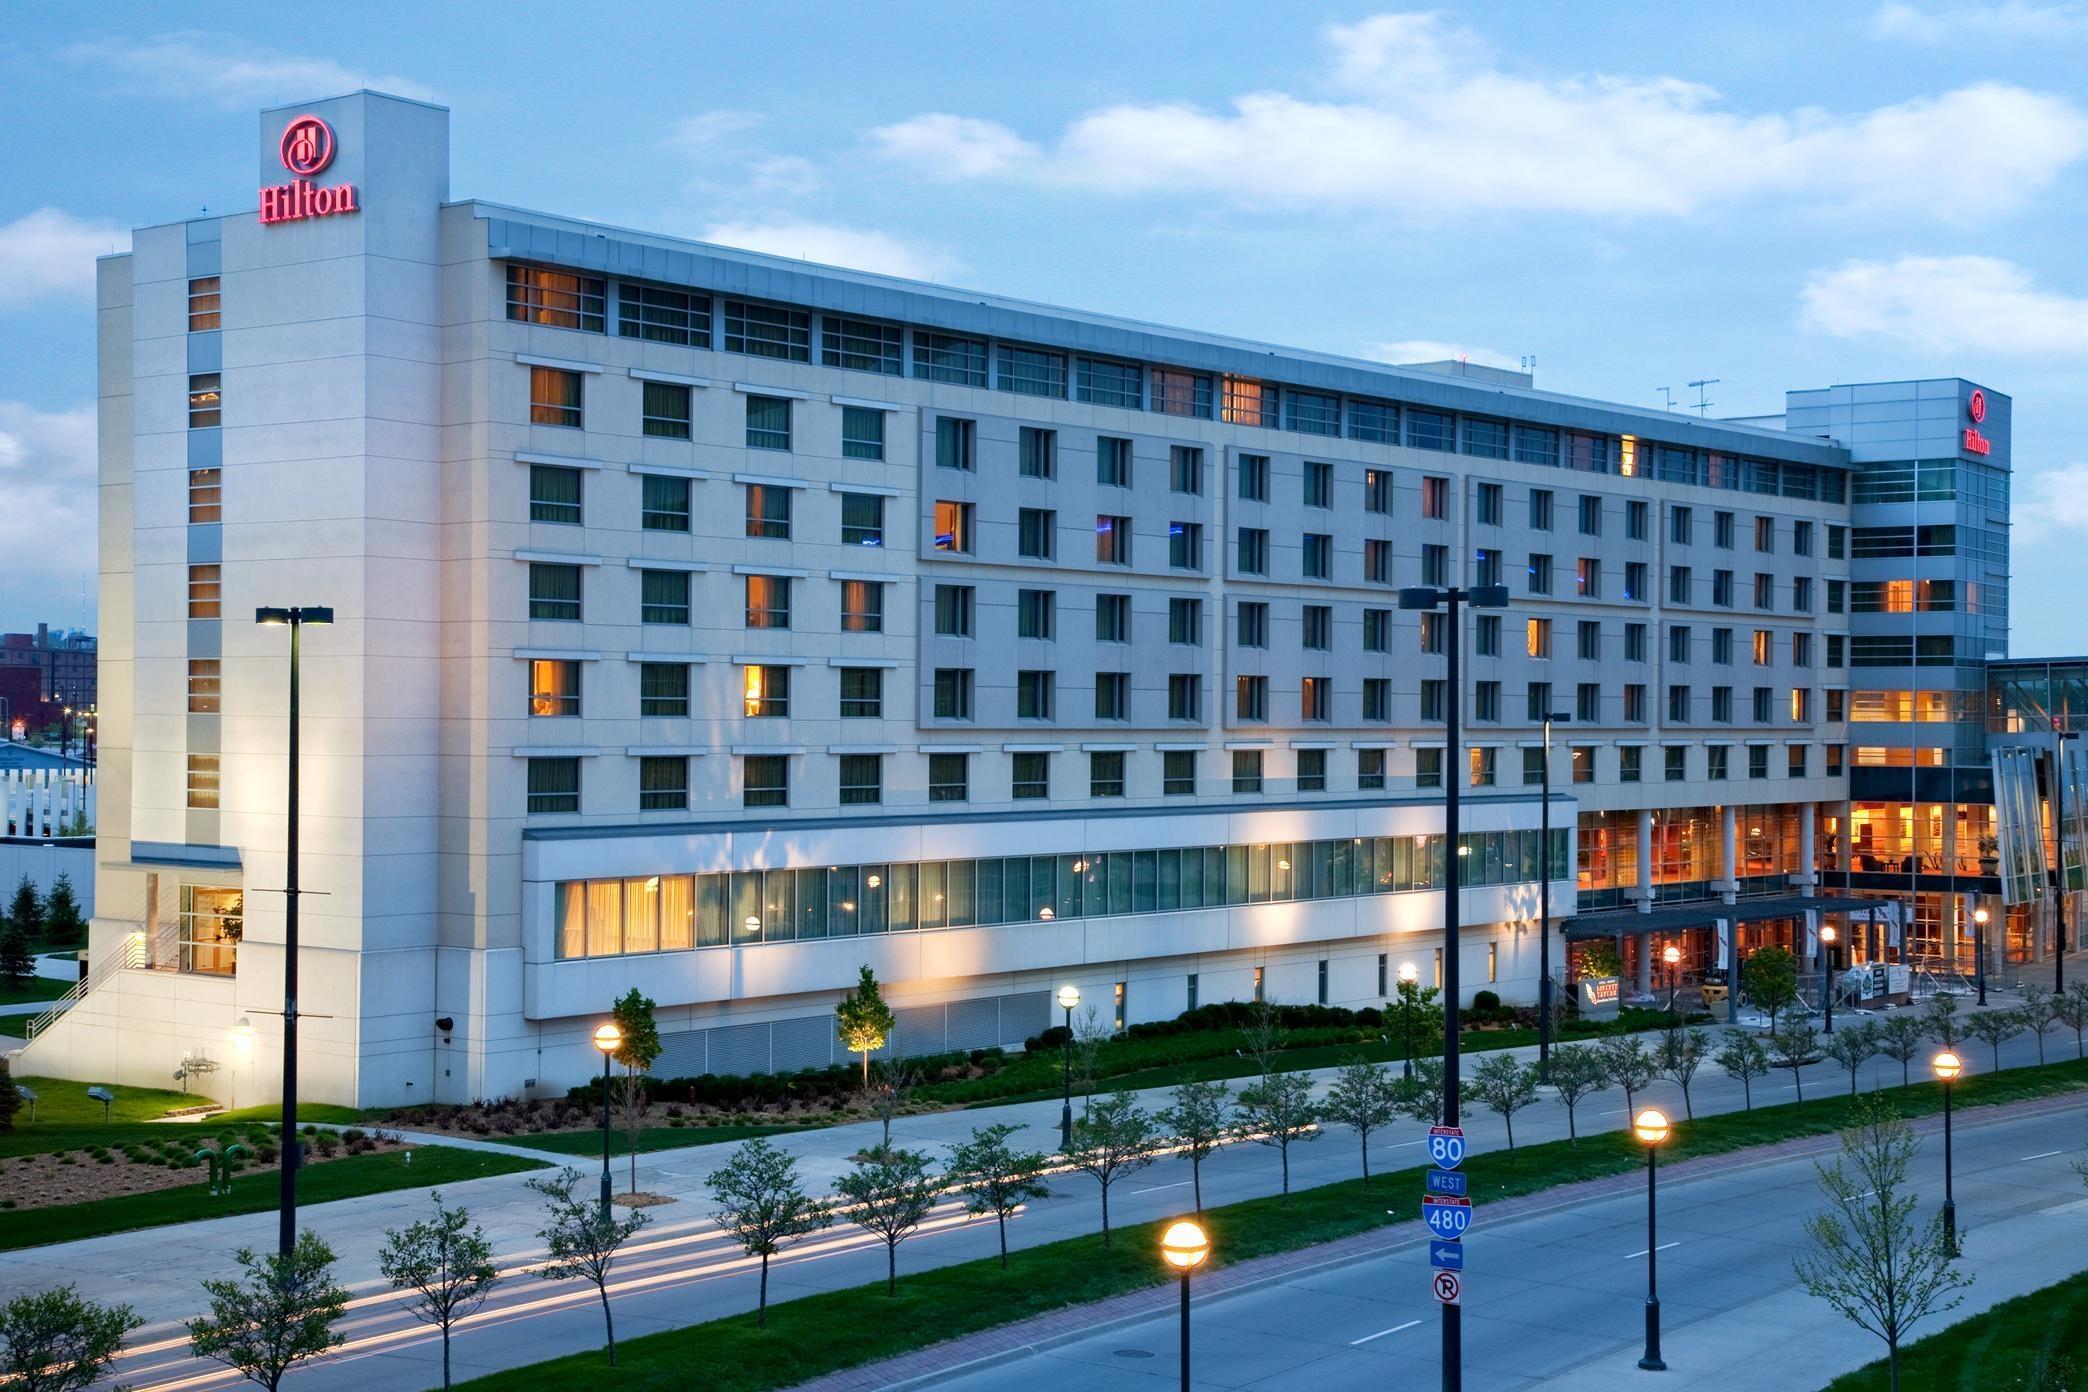 Hilton Omaha image 0